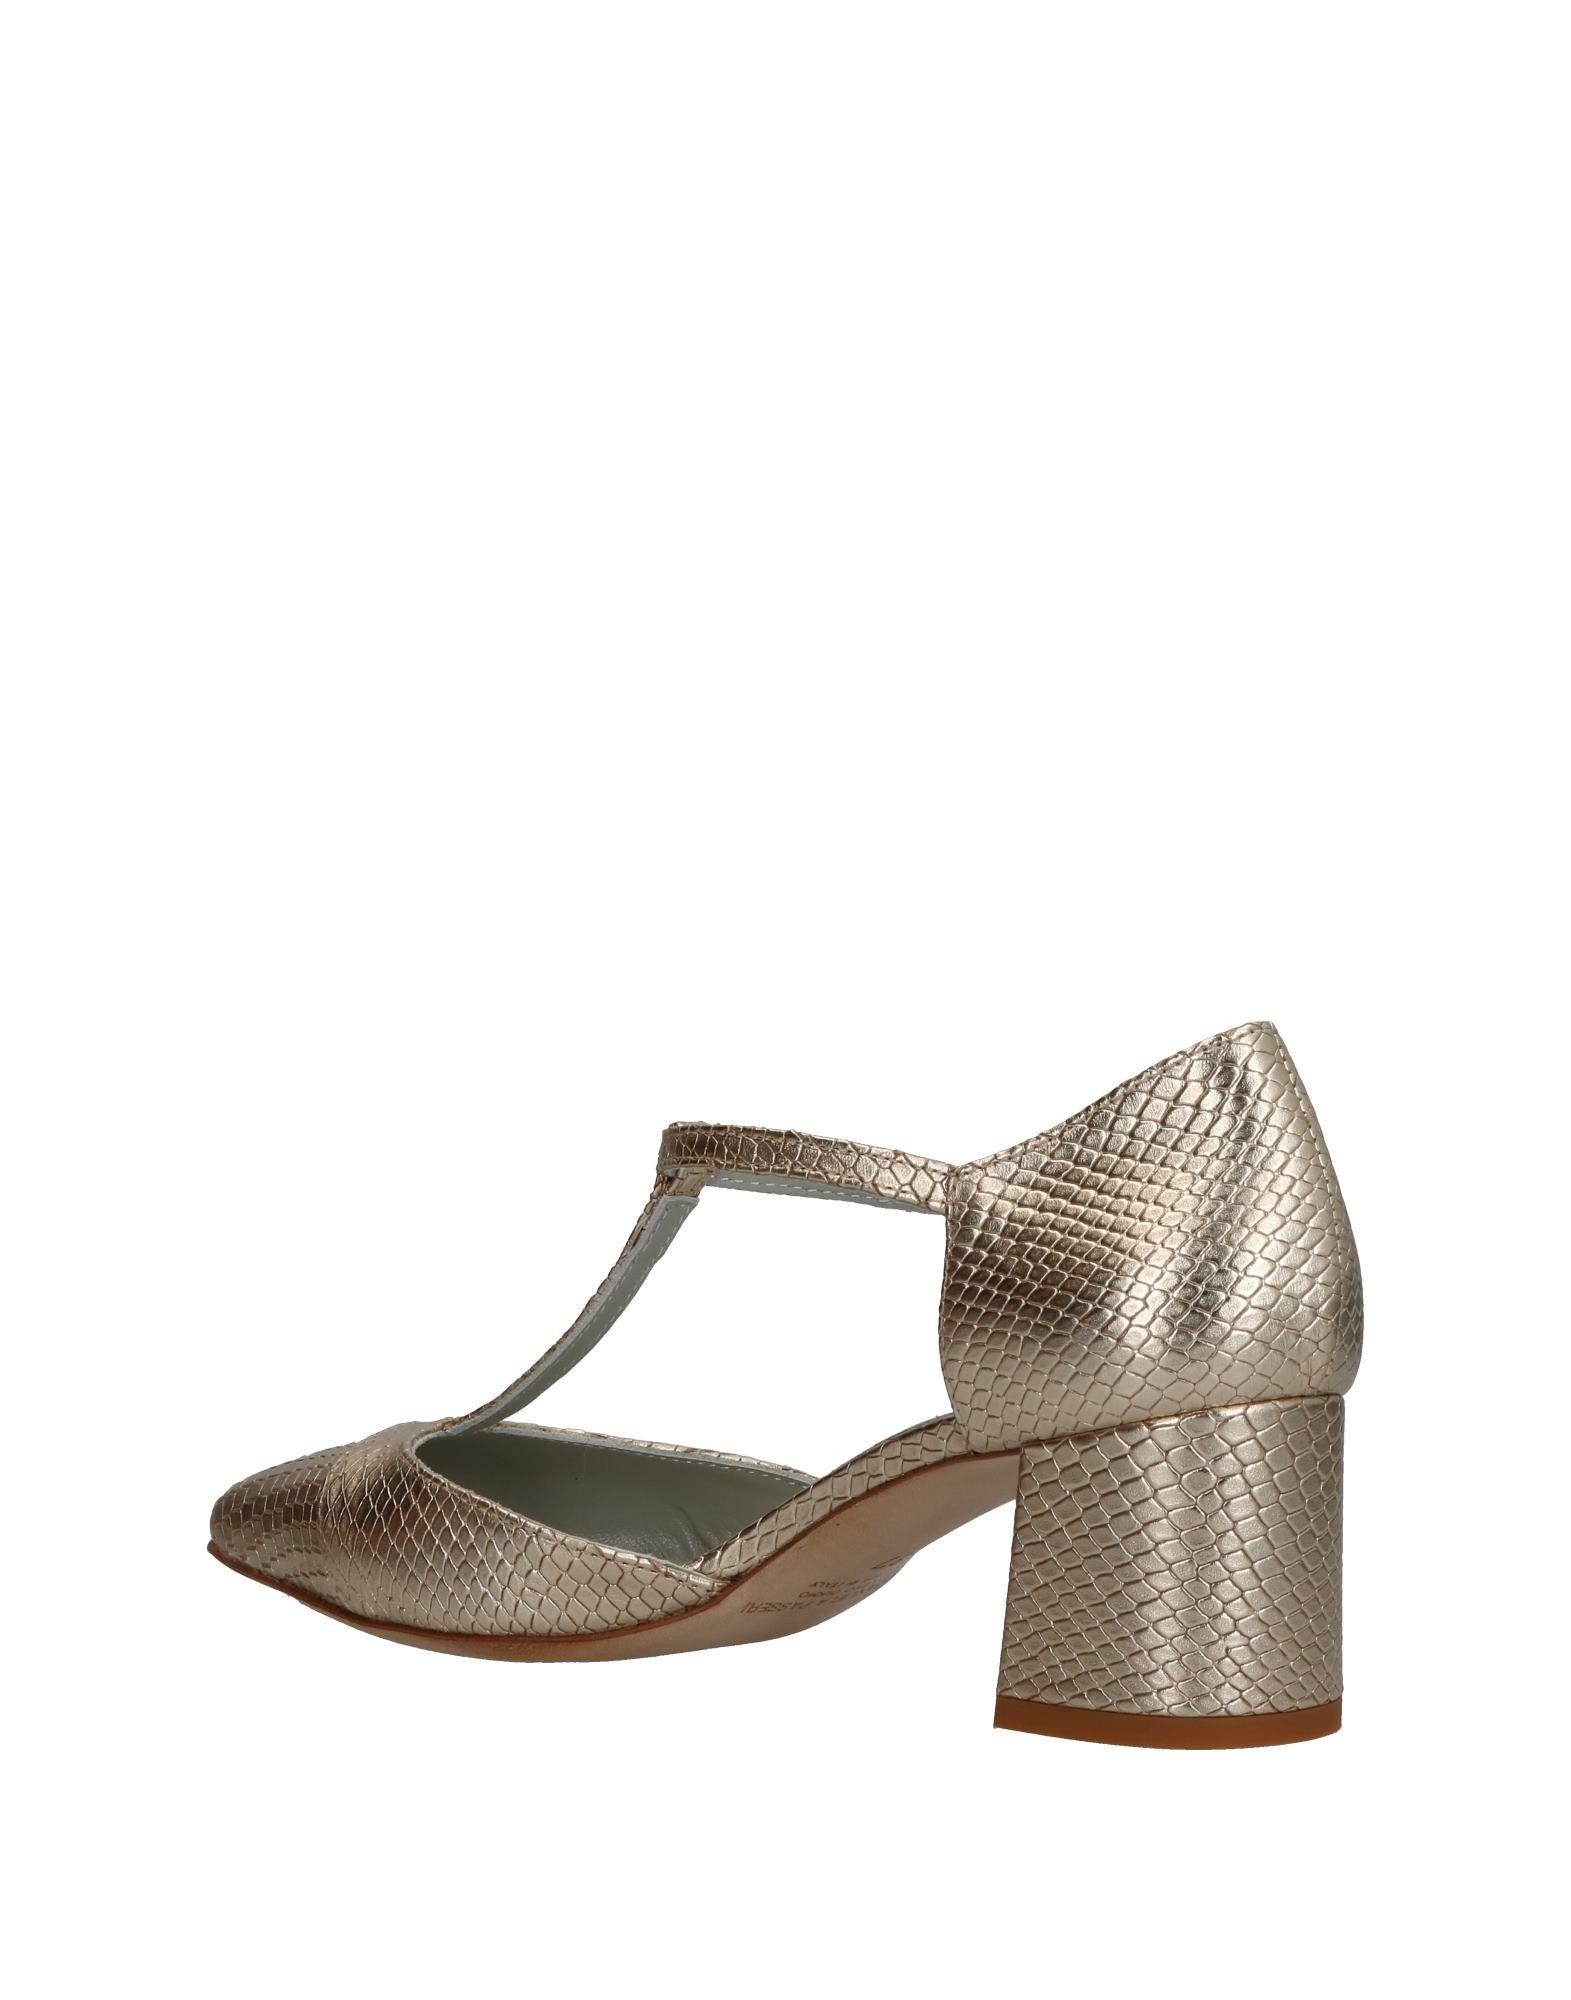 Emanuela Passeri Gute Pumps Damen  11331720TT Gute Passeri Qualität beliebte Schuhe f63261